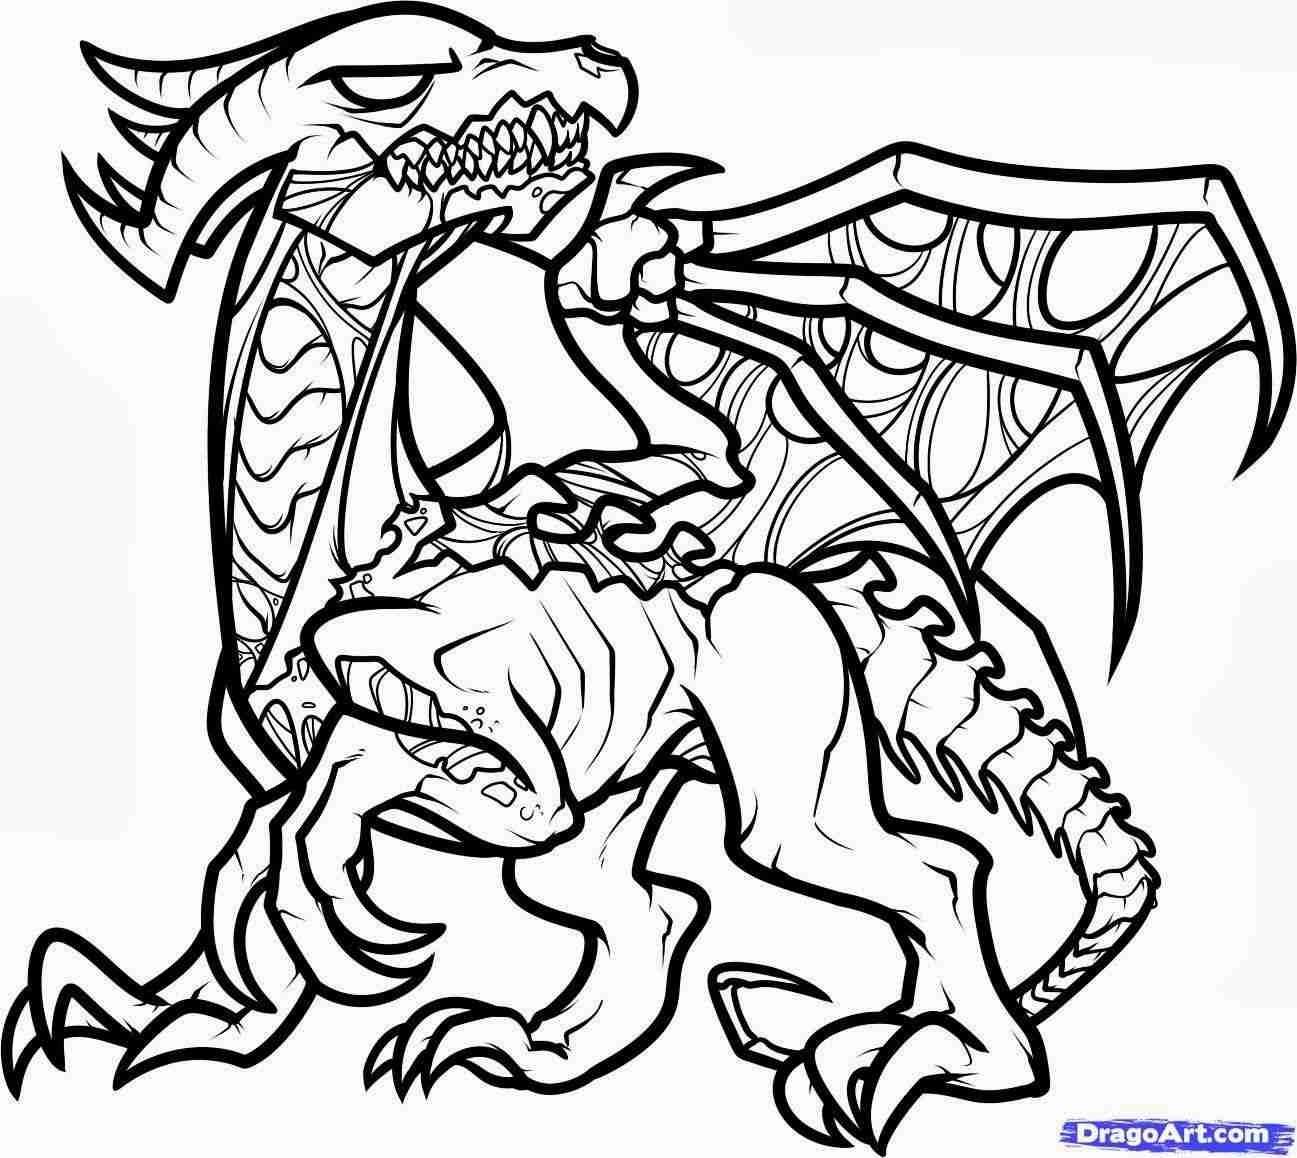 Minecraft Ender Dragon Coloring Pages Novocom Top